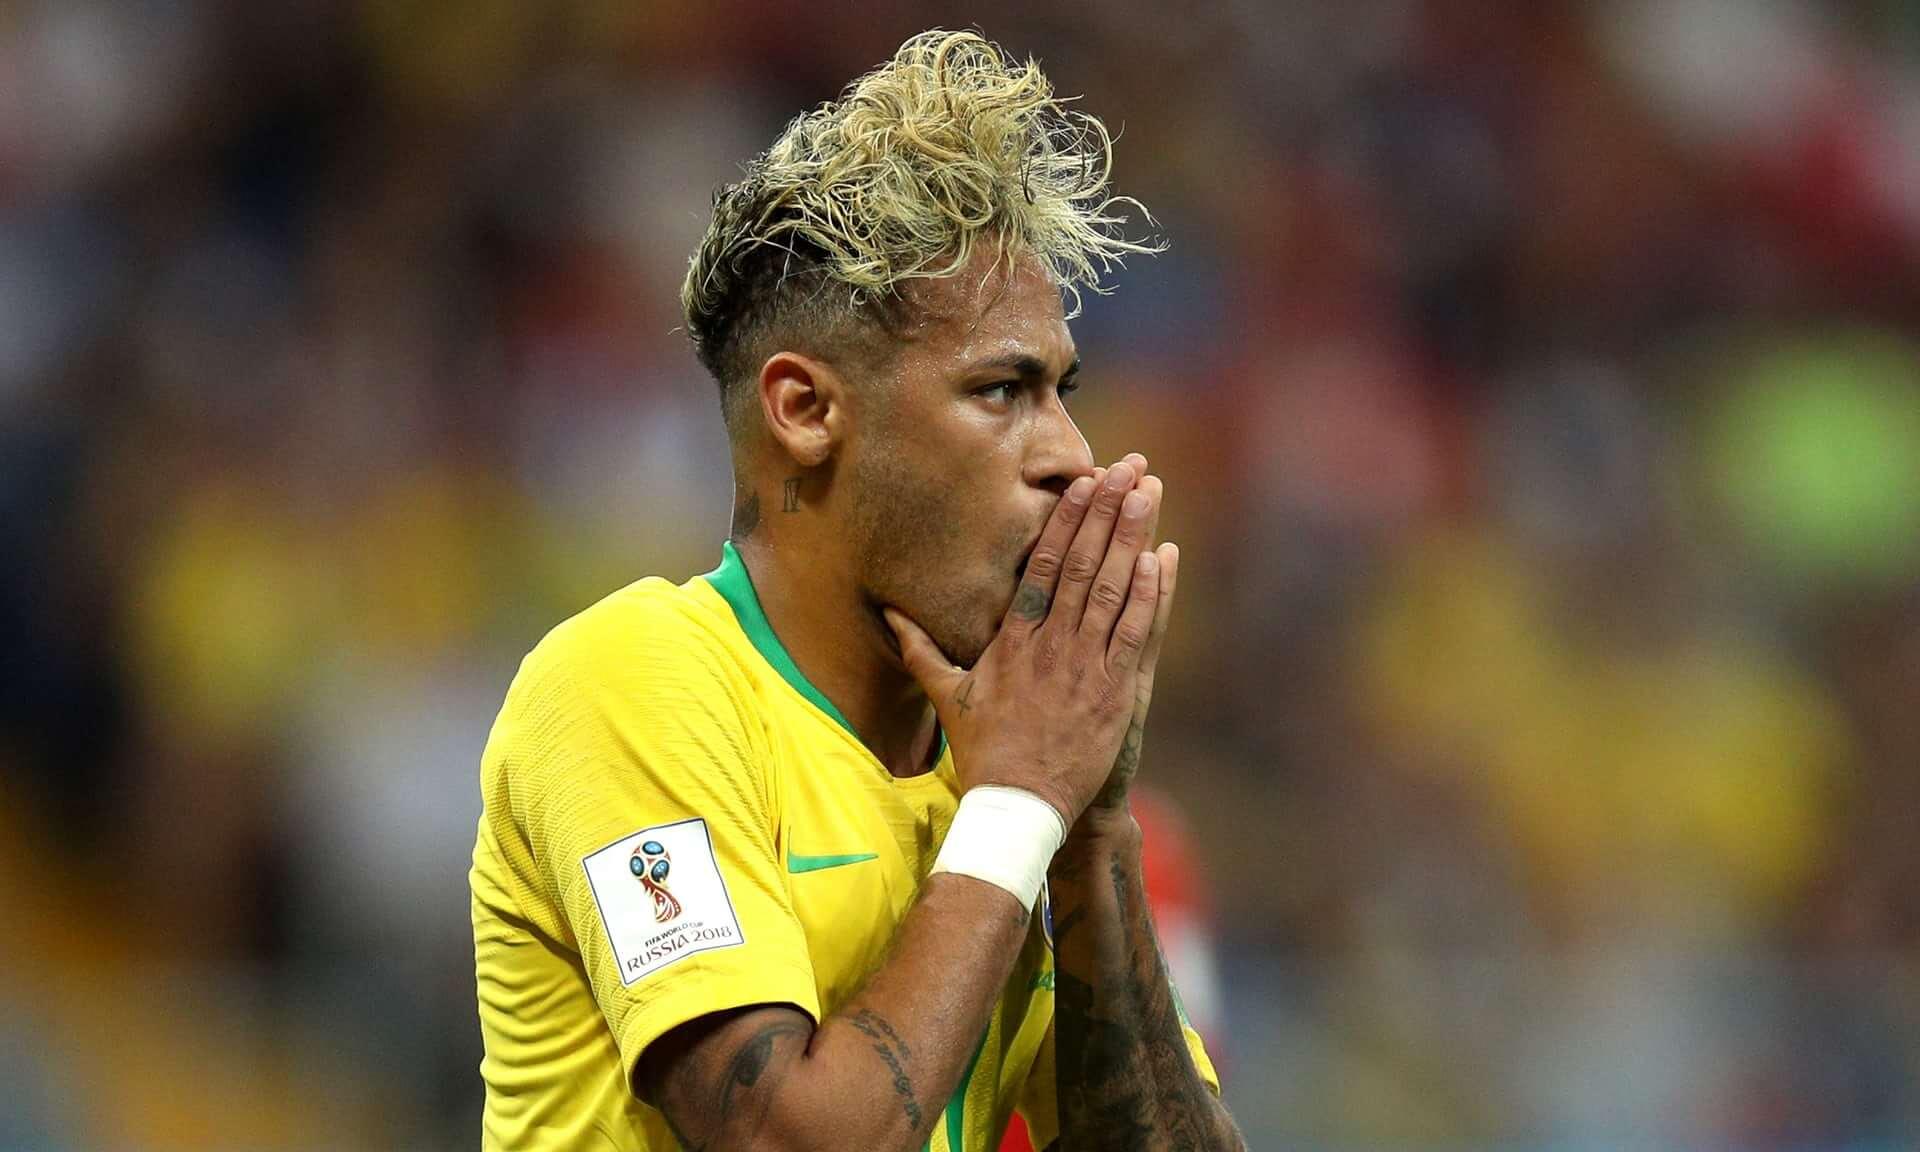 2018VB - Brazília 1:1 Svájc (videó)